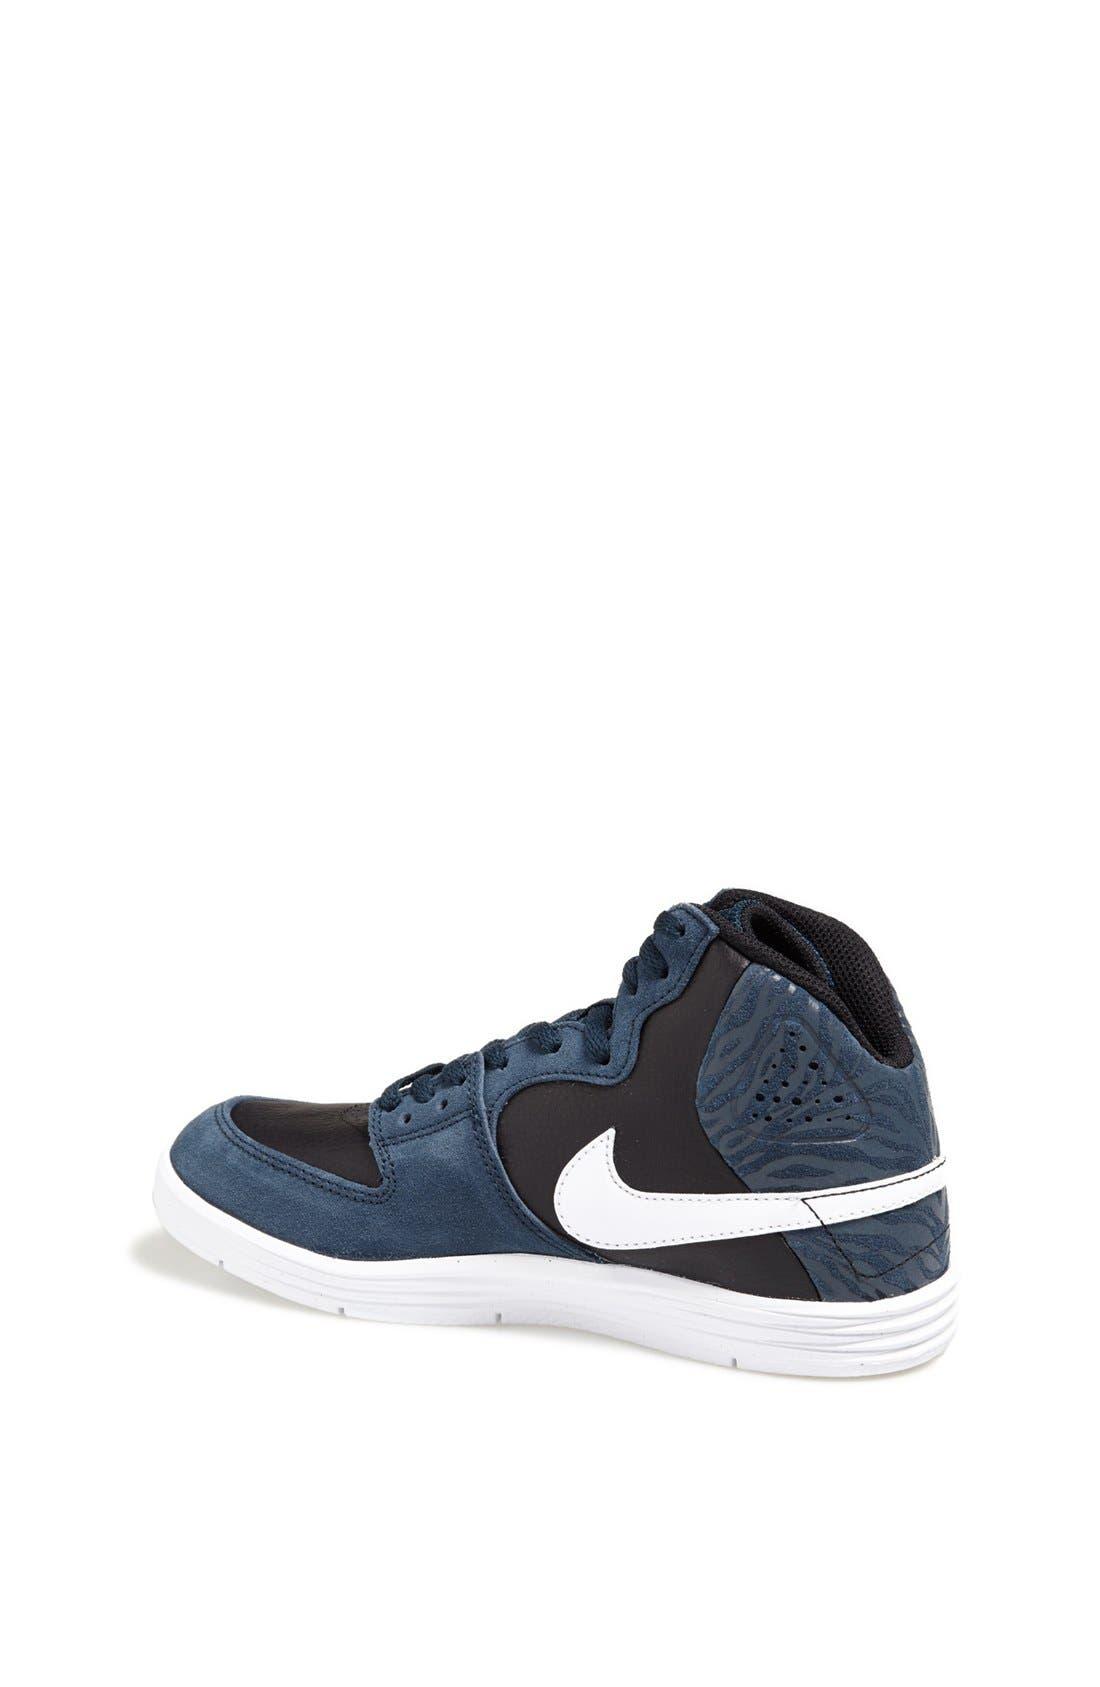 Alternate Image 2  - Nike 'Paul Rodriguez 7' High Top Sneaker (Big Kid)